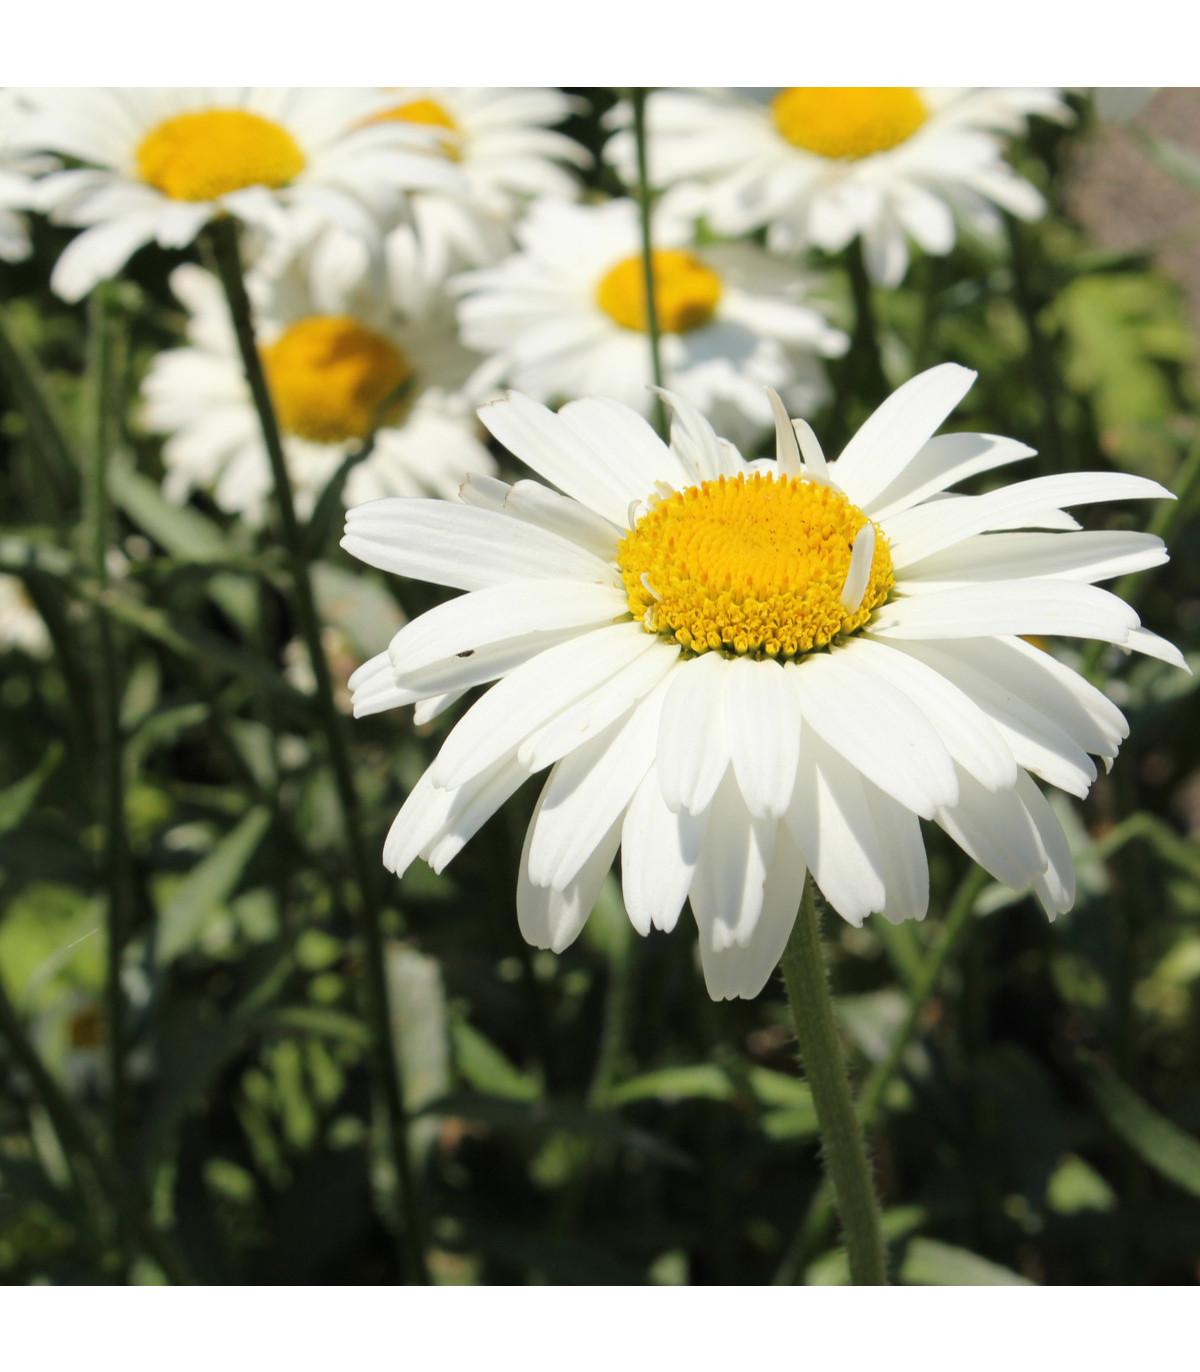 Margaréta biela Alaska - Chrysanthemum leucanthemum max. - semená - 250 ks